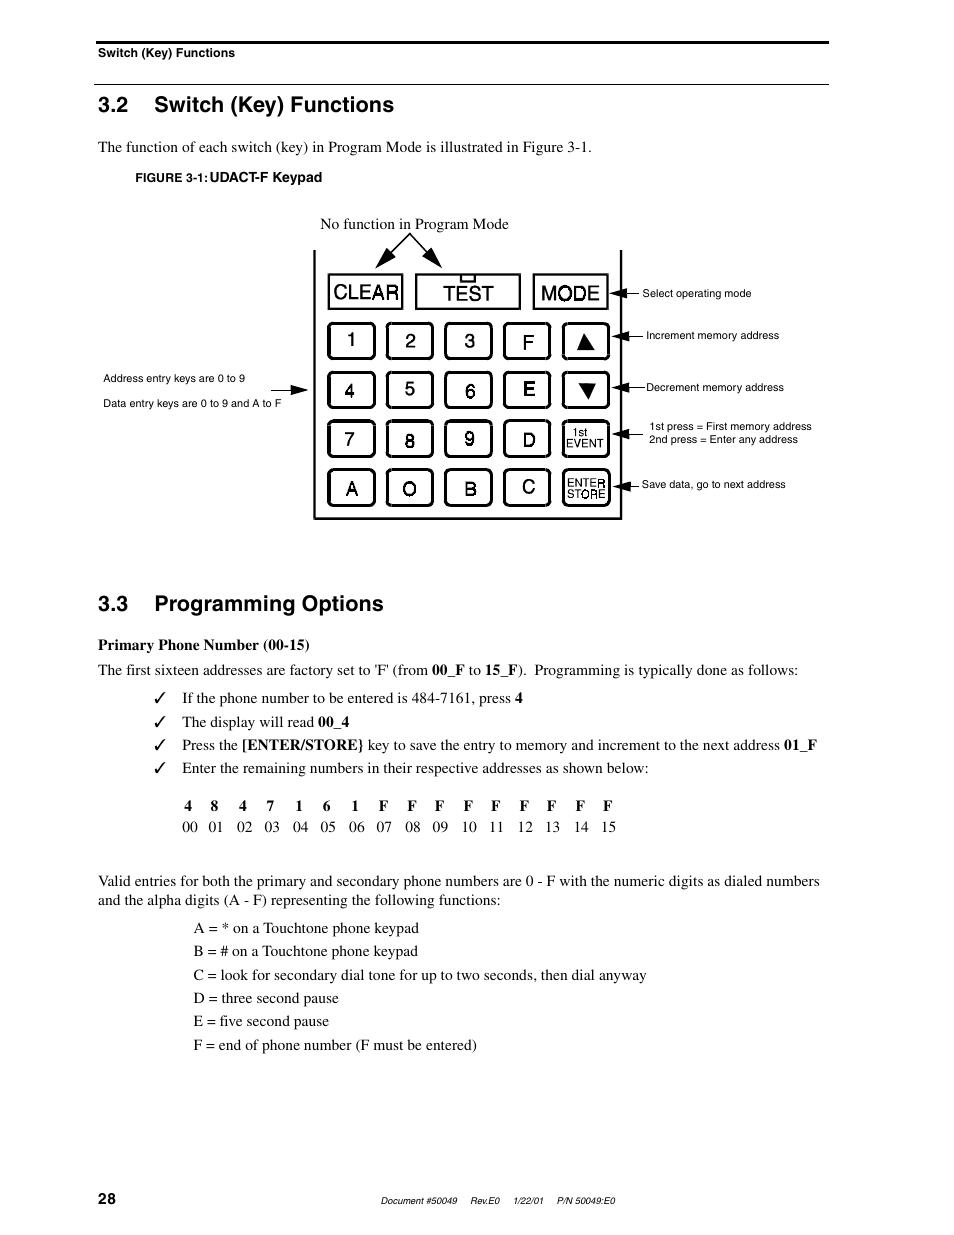 2 switch (key) functions, 3 programming options | Fire-Lite UDACT-F  Universal Digital Alarm Communicator Transmitter User Manual | Page 28 / 68